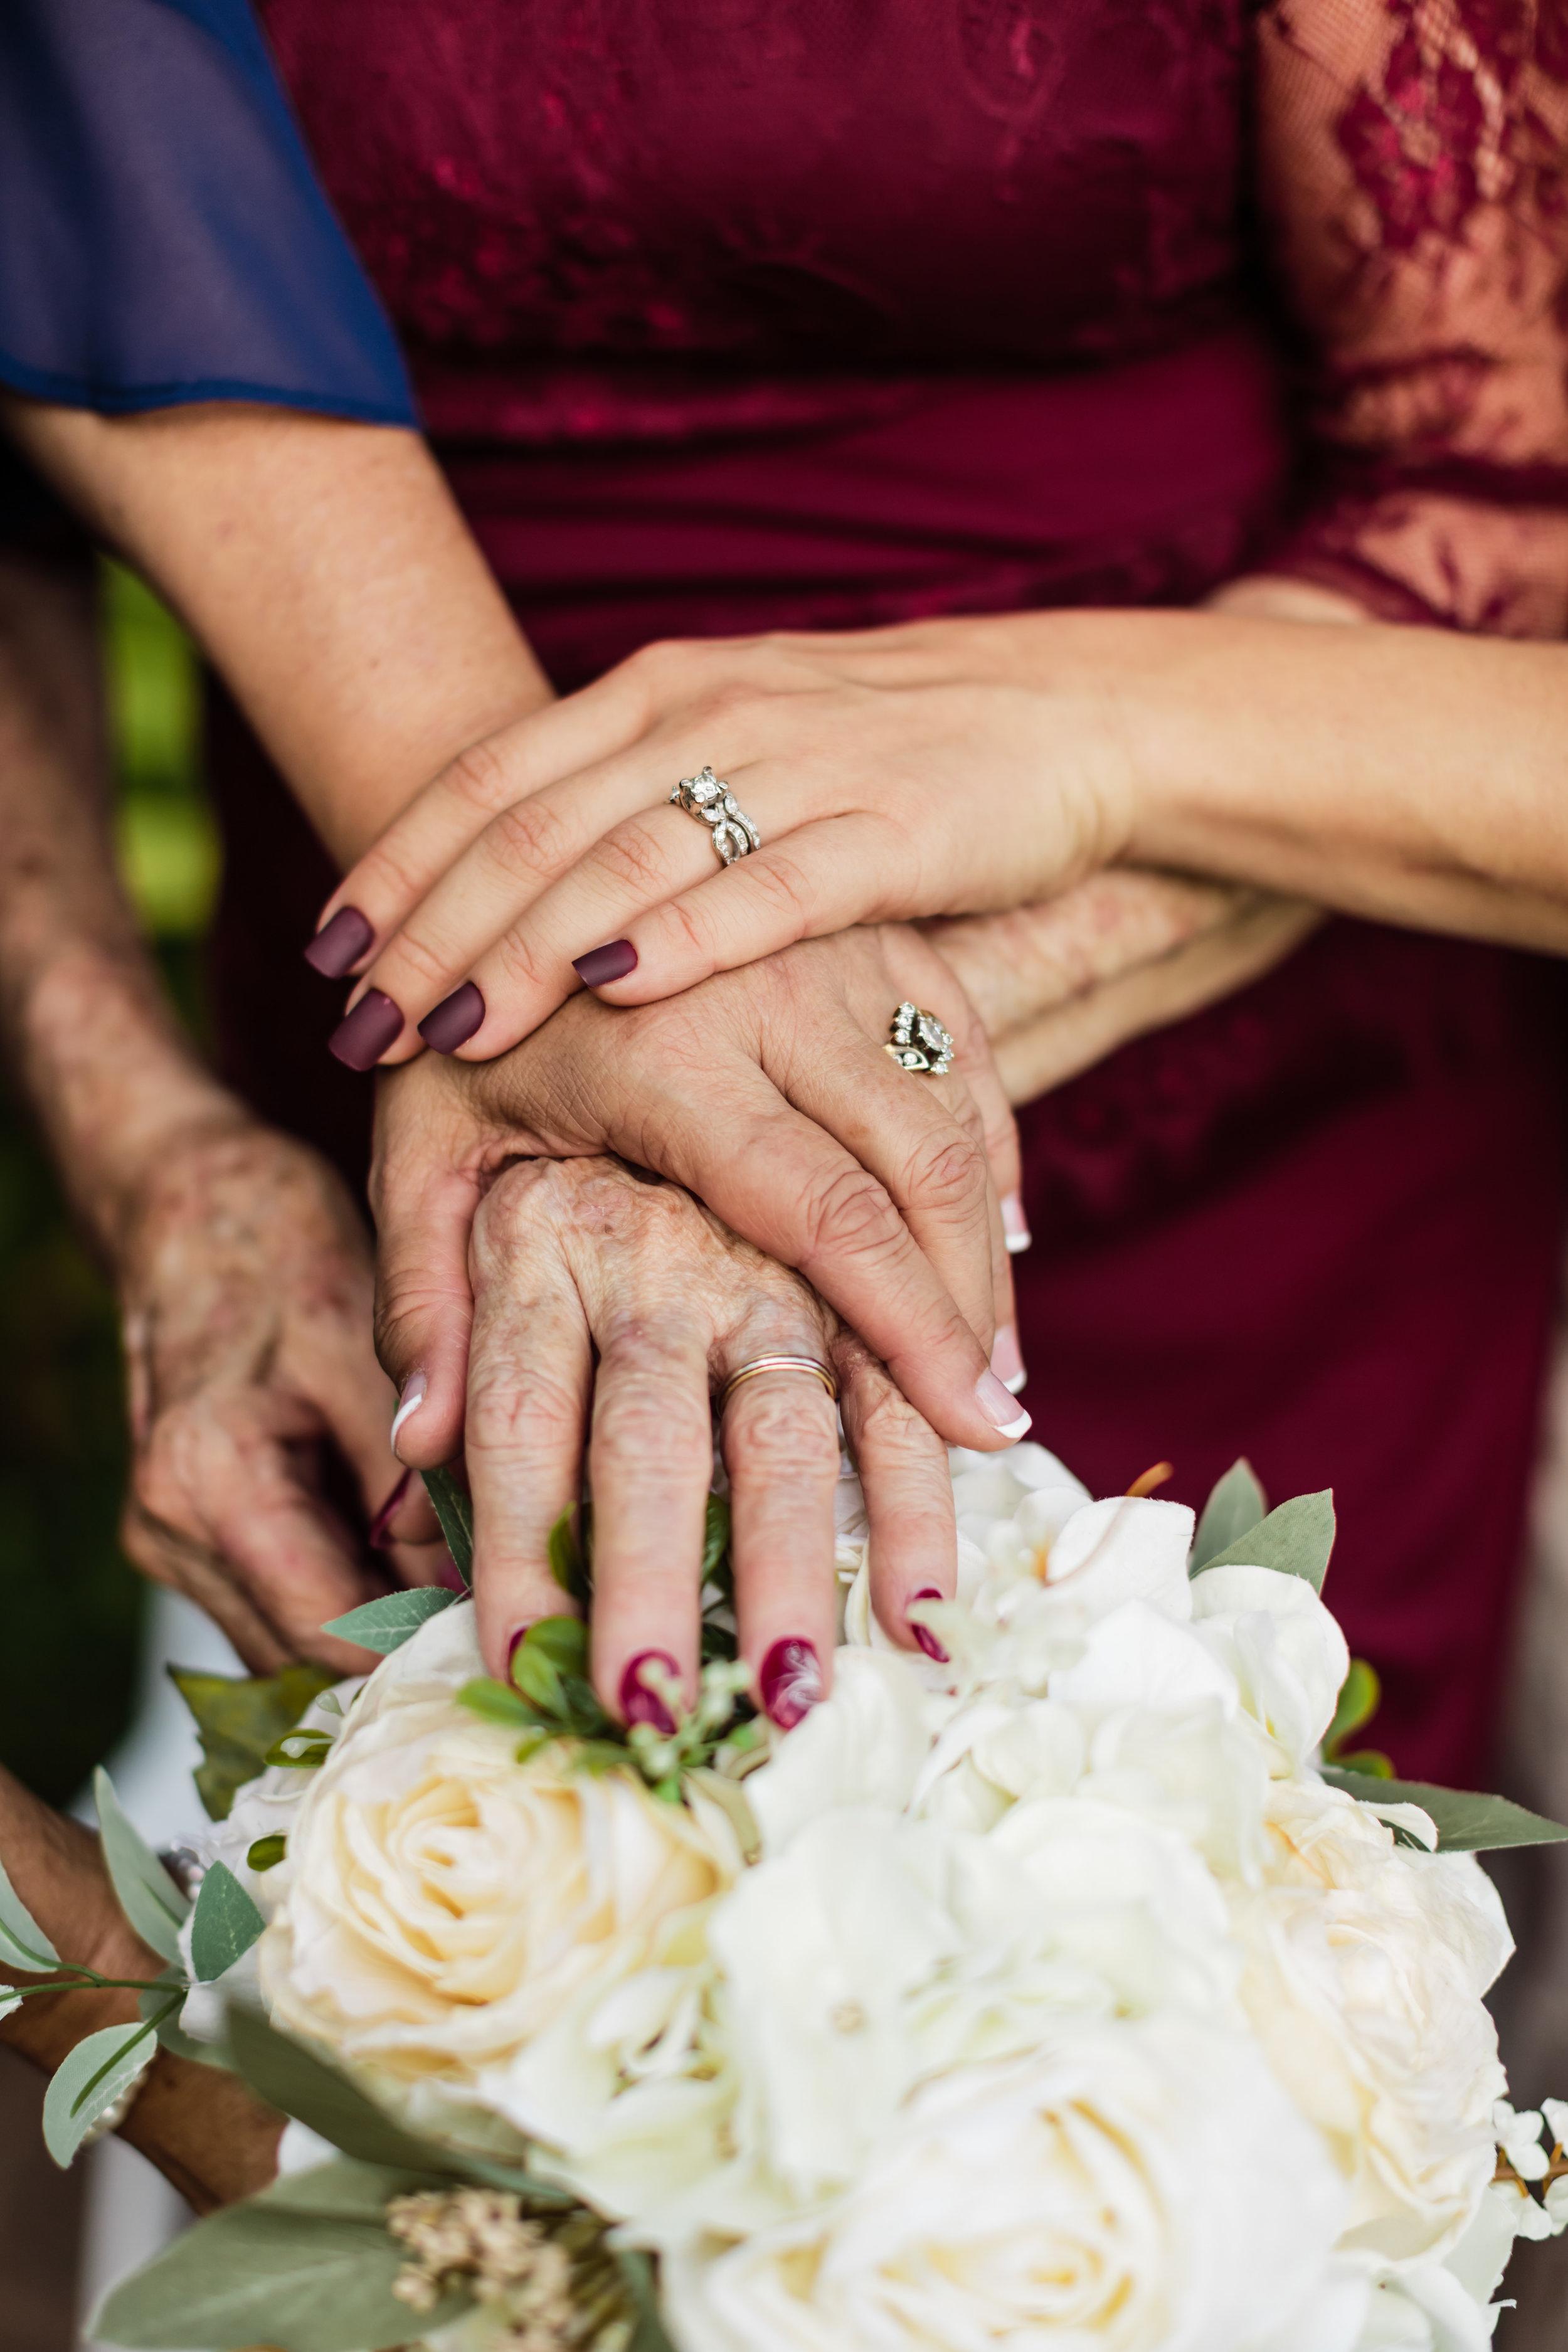 2018.11.18 Steve and Emily Mounts Botanical West Palm Beach Wedding (374 of 827).jpg